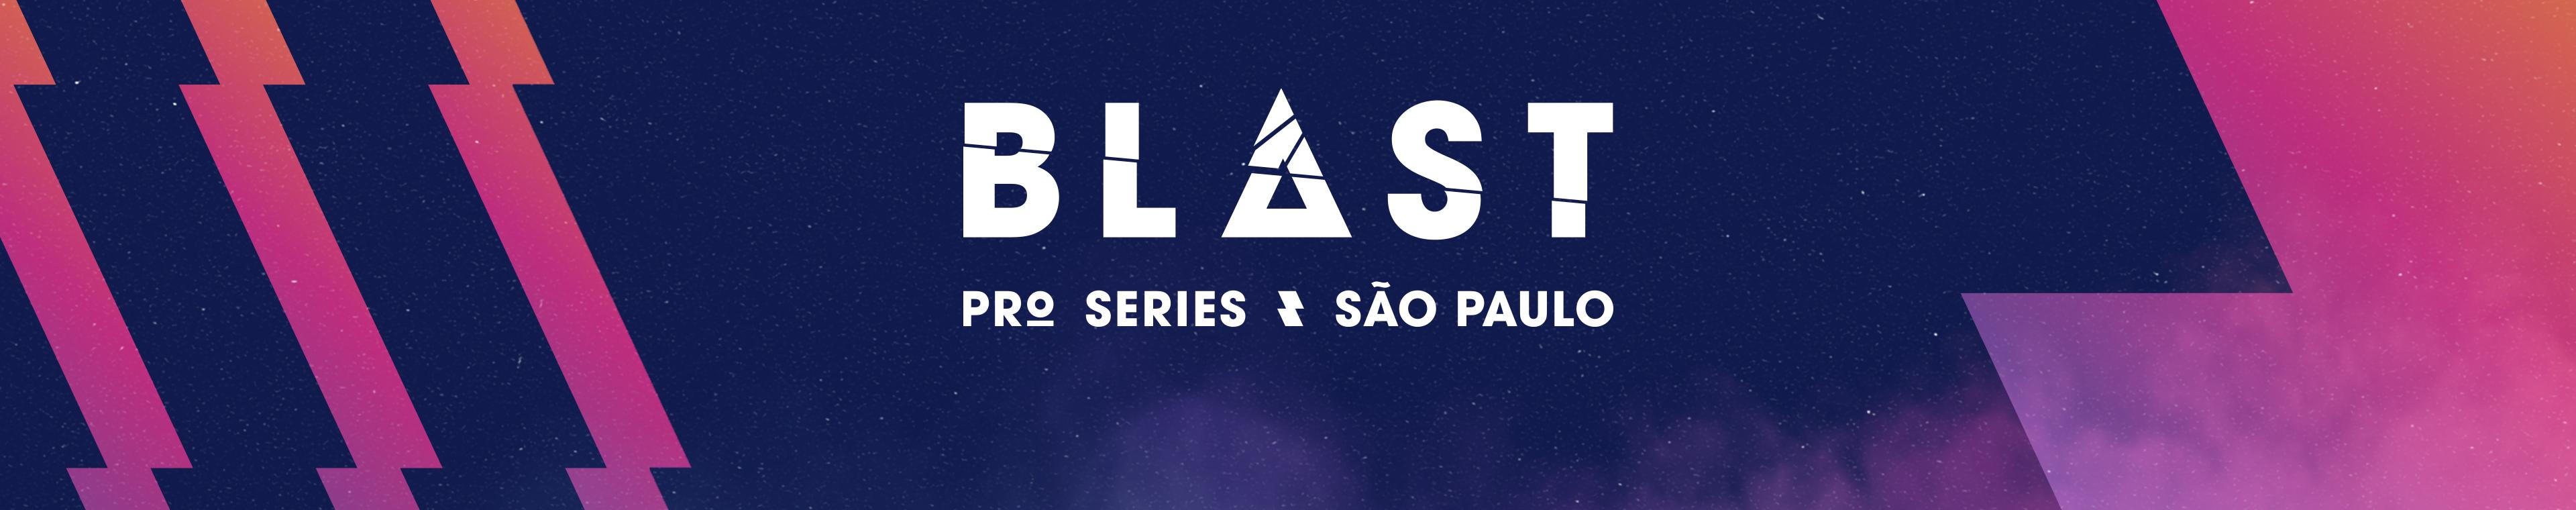 BLAST Pro Series: Sao Paulo 2019